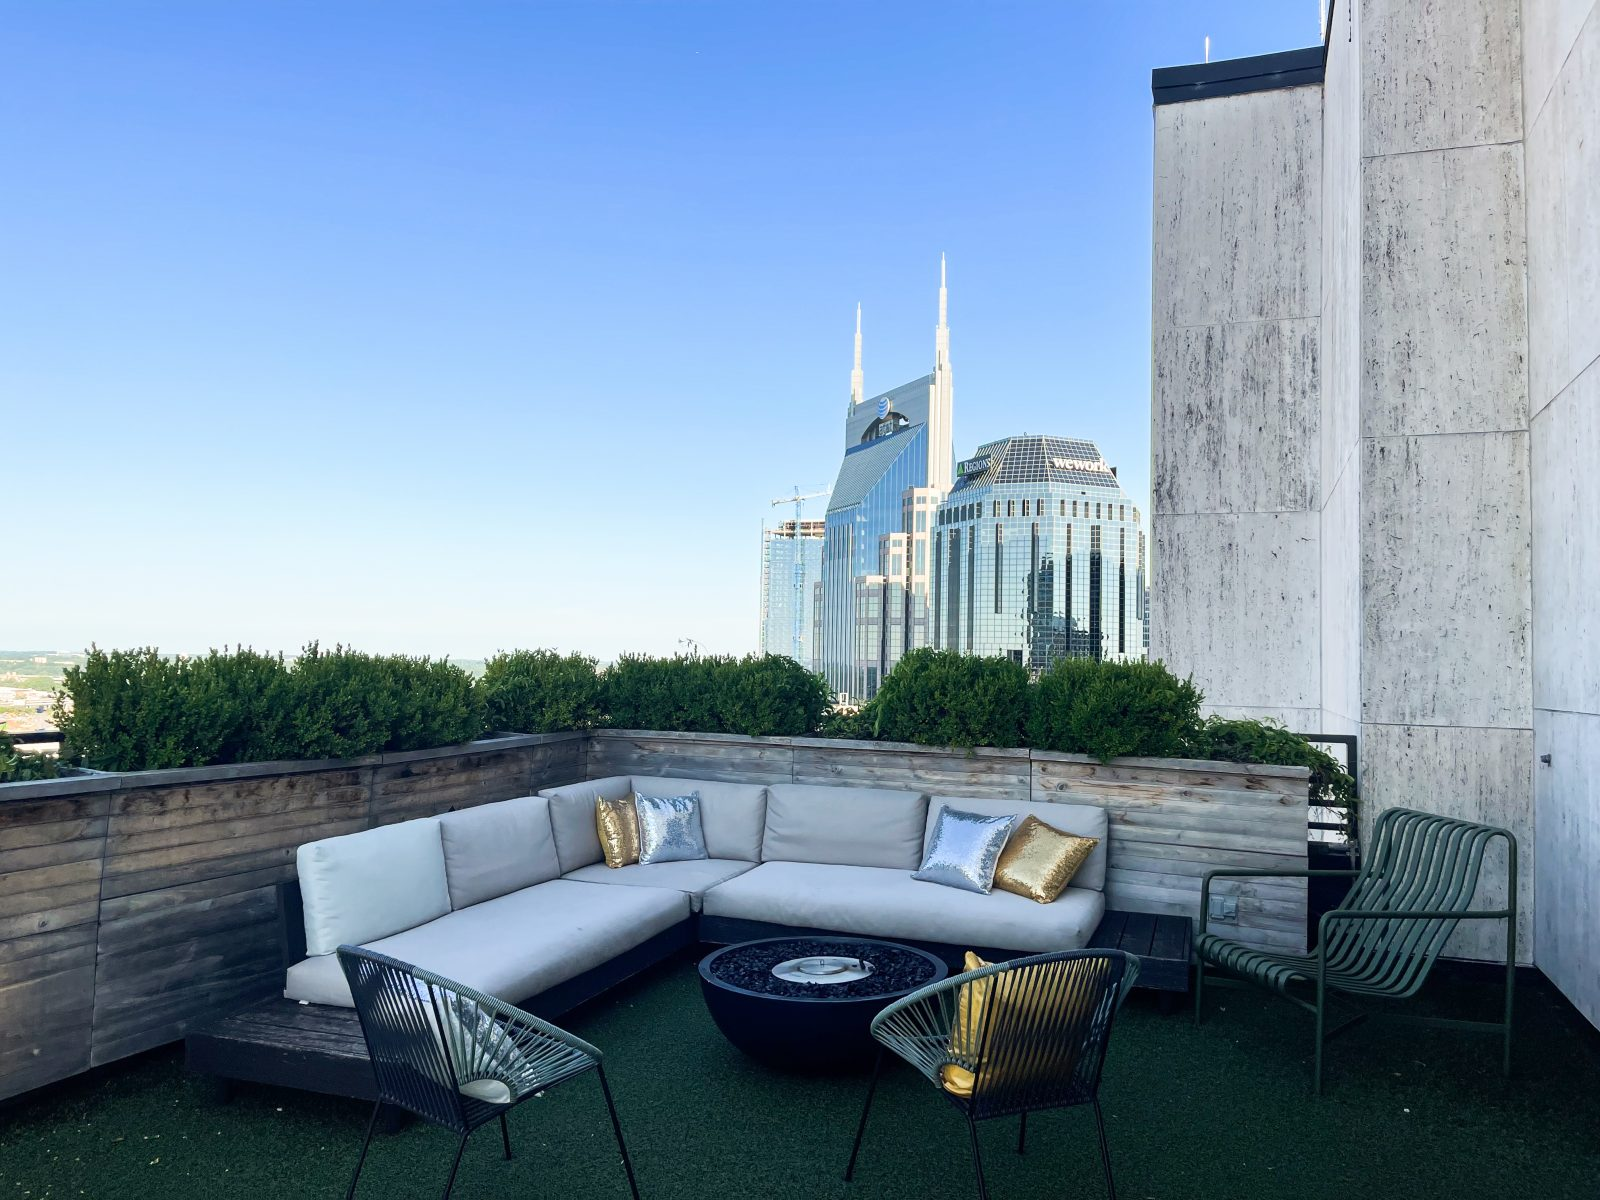 Fairlane Hotel rooftop lounge in Nashville, TN